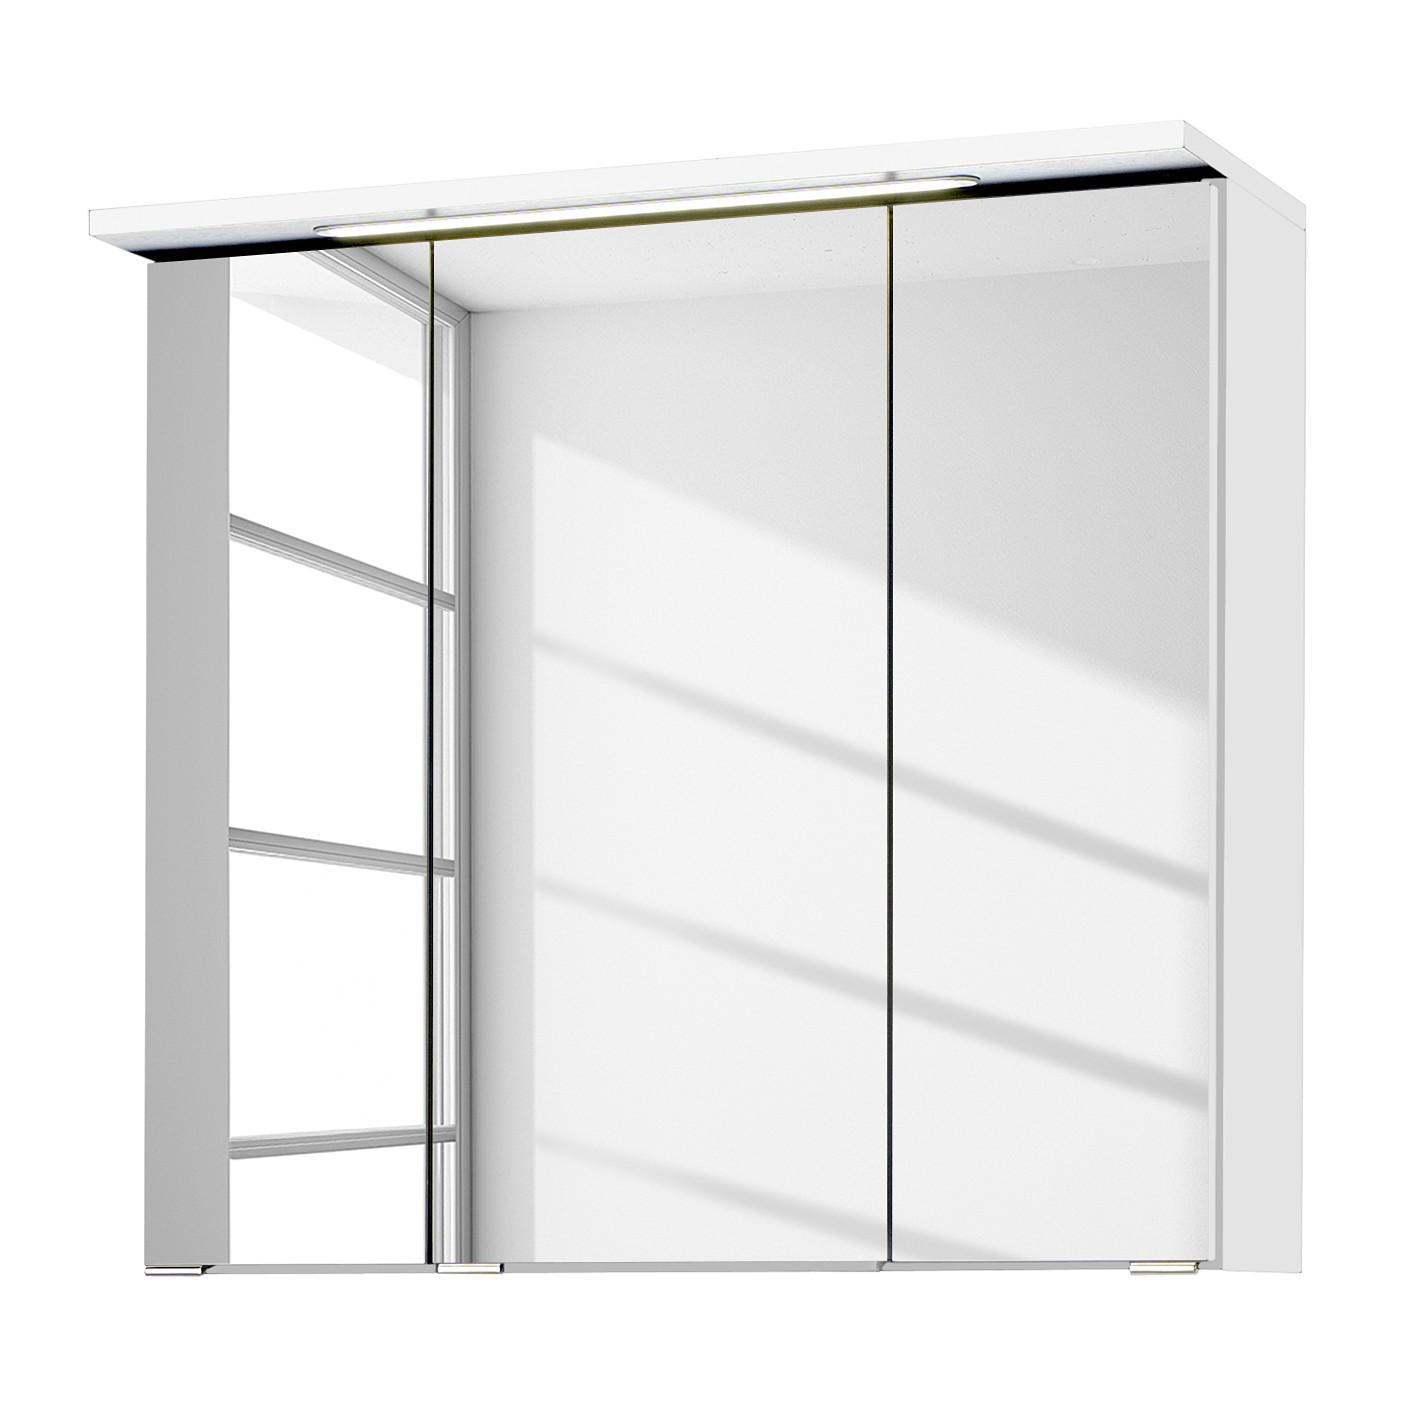 spiegelschrank zeehan wei 70 cm giessbach ma e breite 70 cm. Black Bedroom Furniture Sets. Home Design Ideas